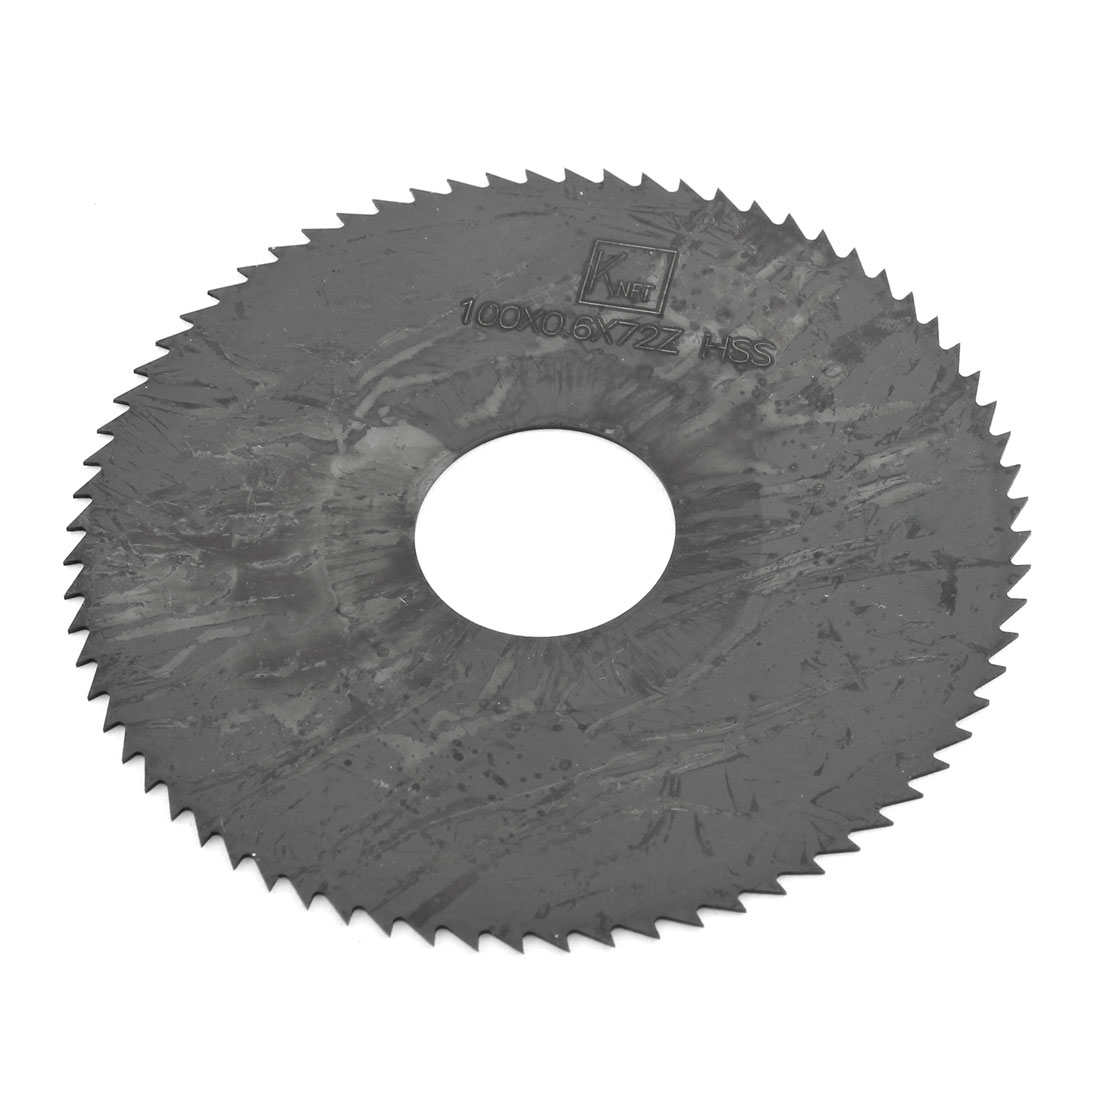 100mm x 0.6mm HSS 72 Teeth Milling Slotting Cutting Tool Slitting Saw